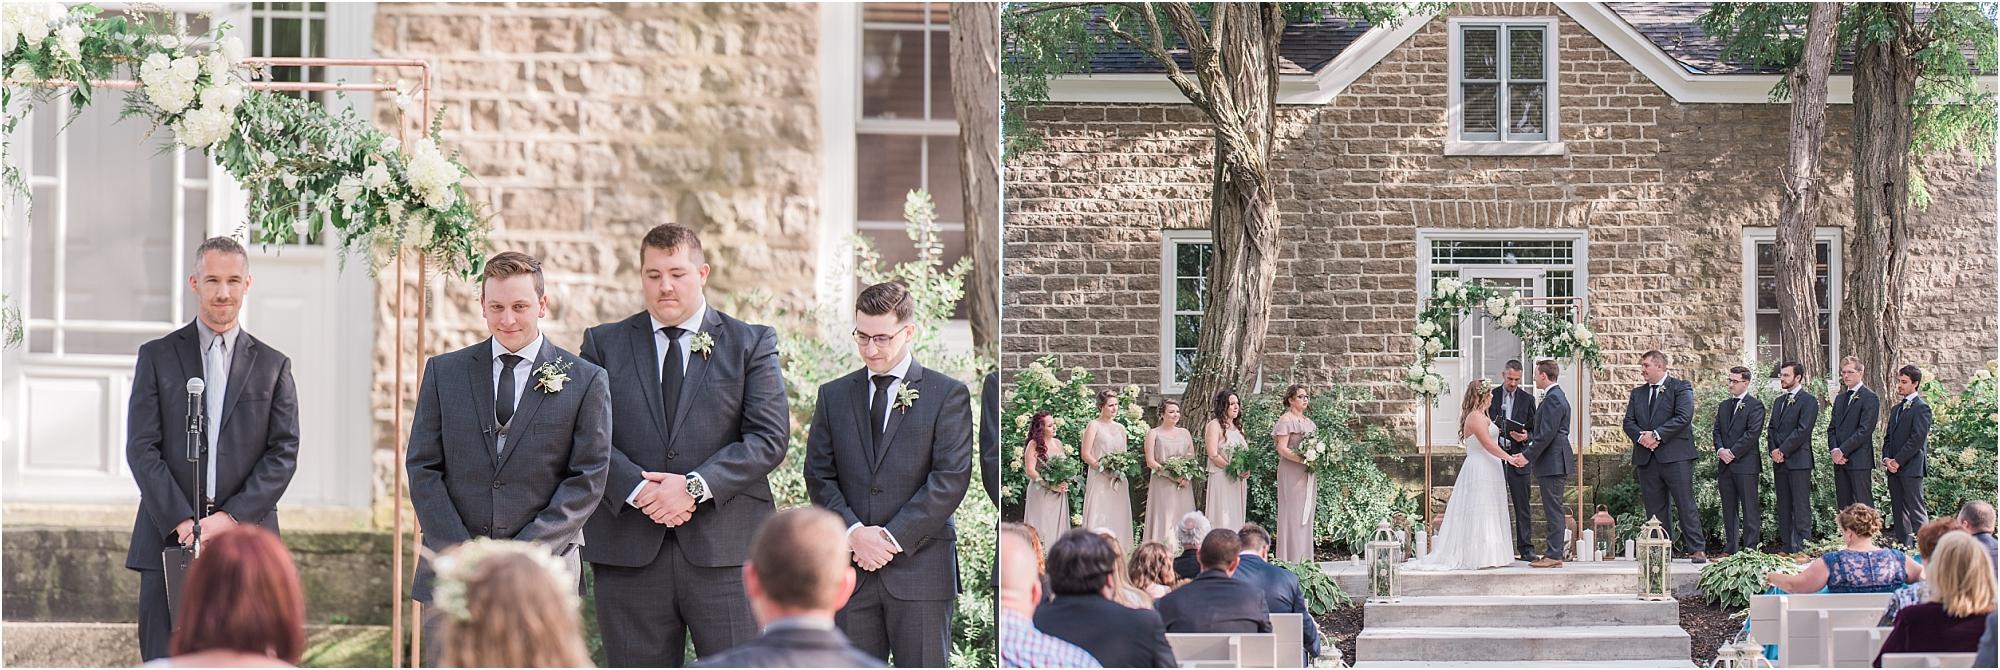 0068 Summer Stonefields Wedding Carleton Place - Ottawa Wedding - Photography by Emma_WEB.jpg